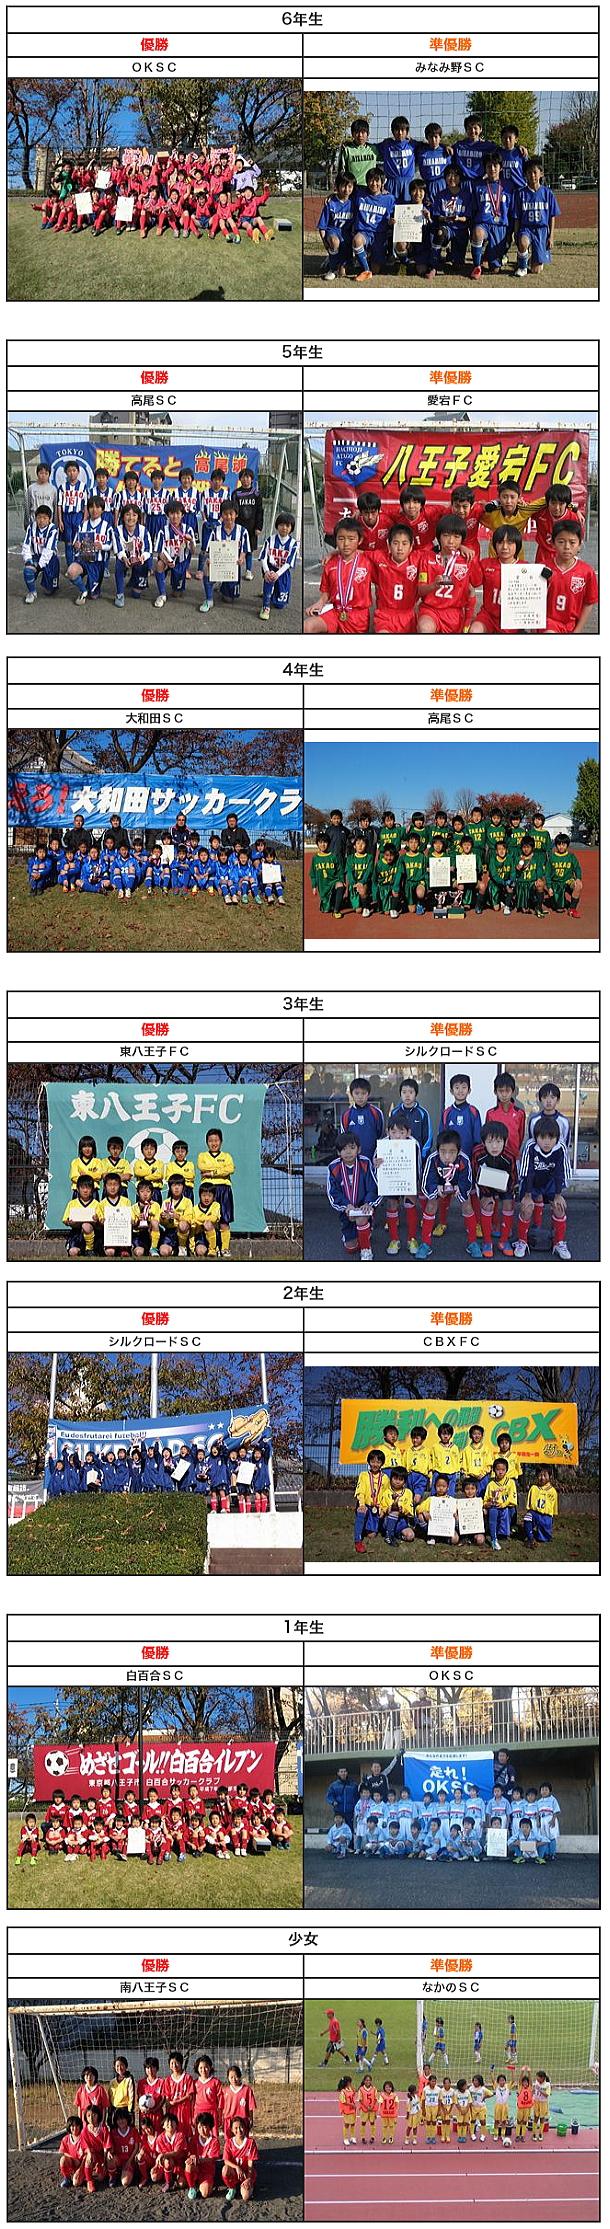 【少年部】第66回市民体育大会 各クラス表彰